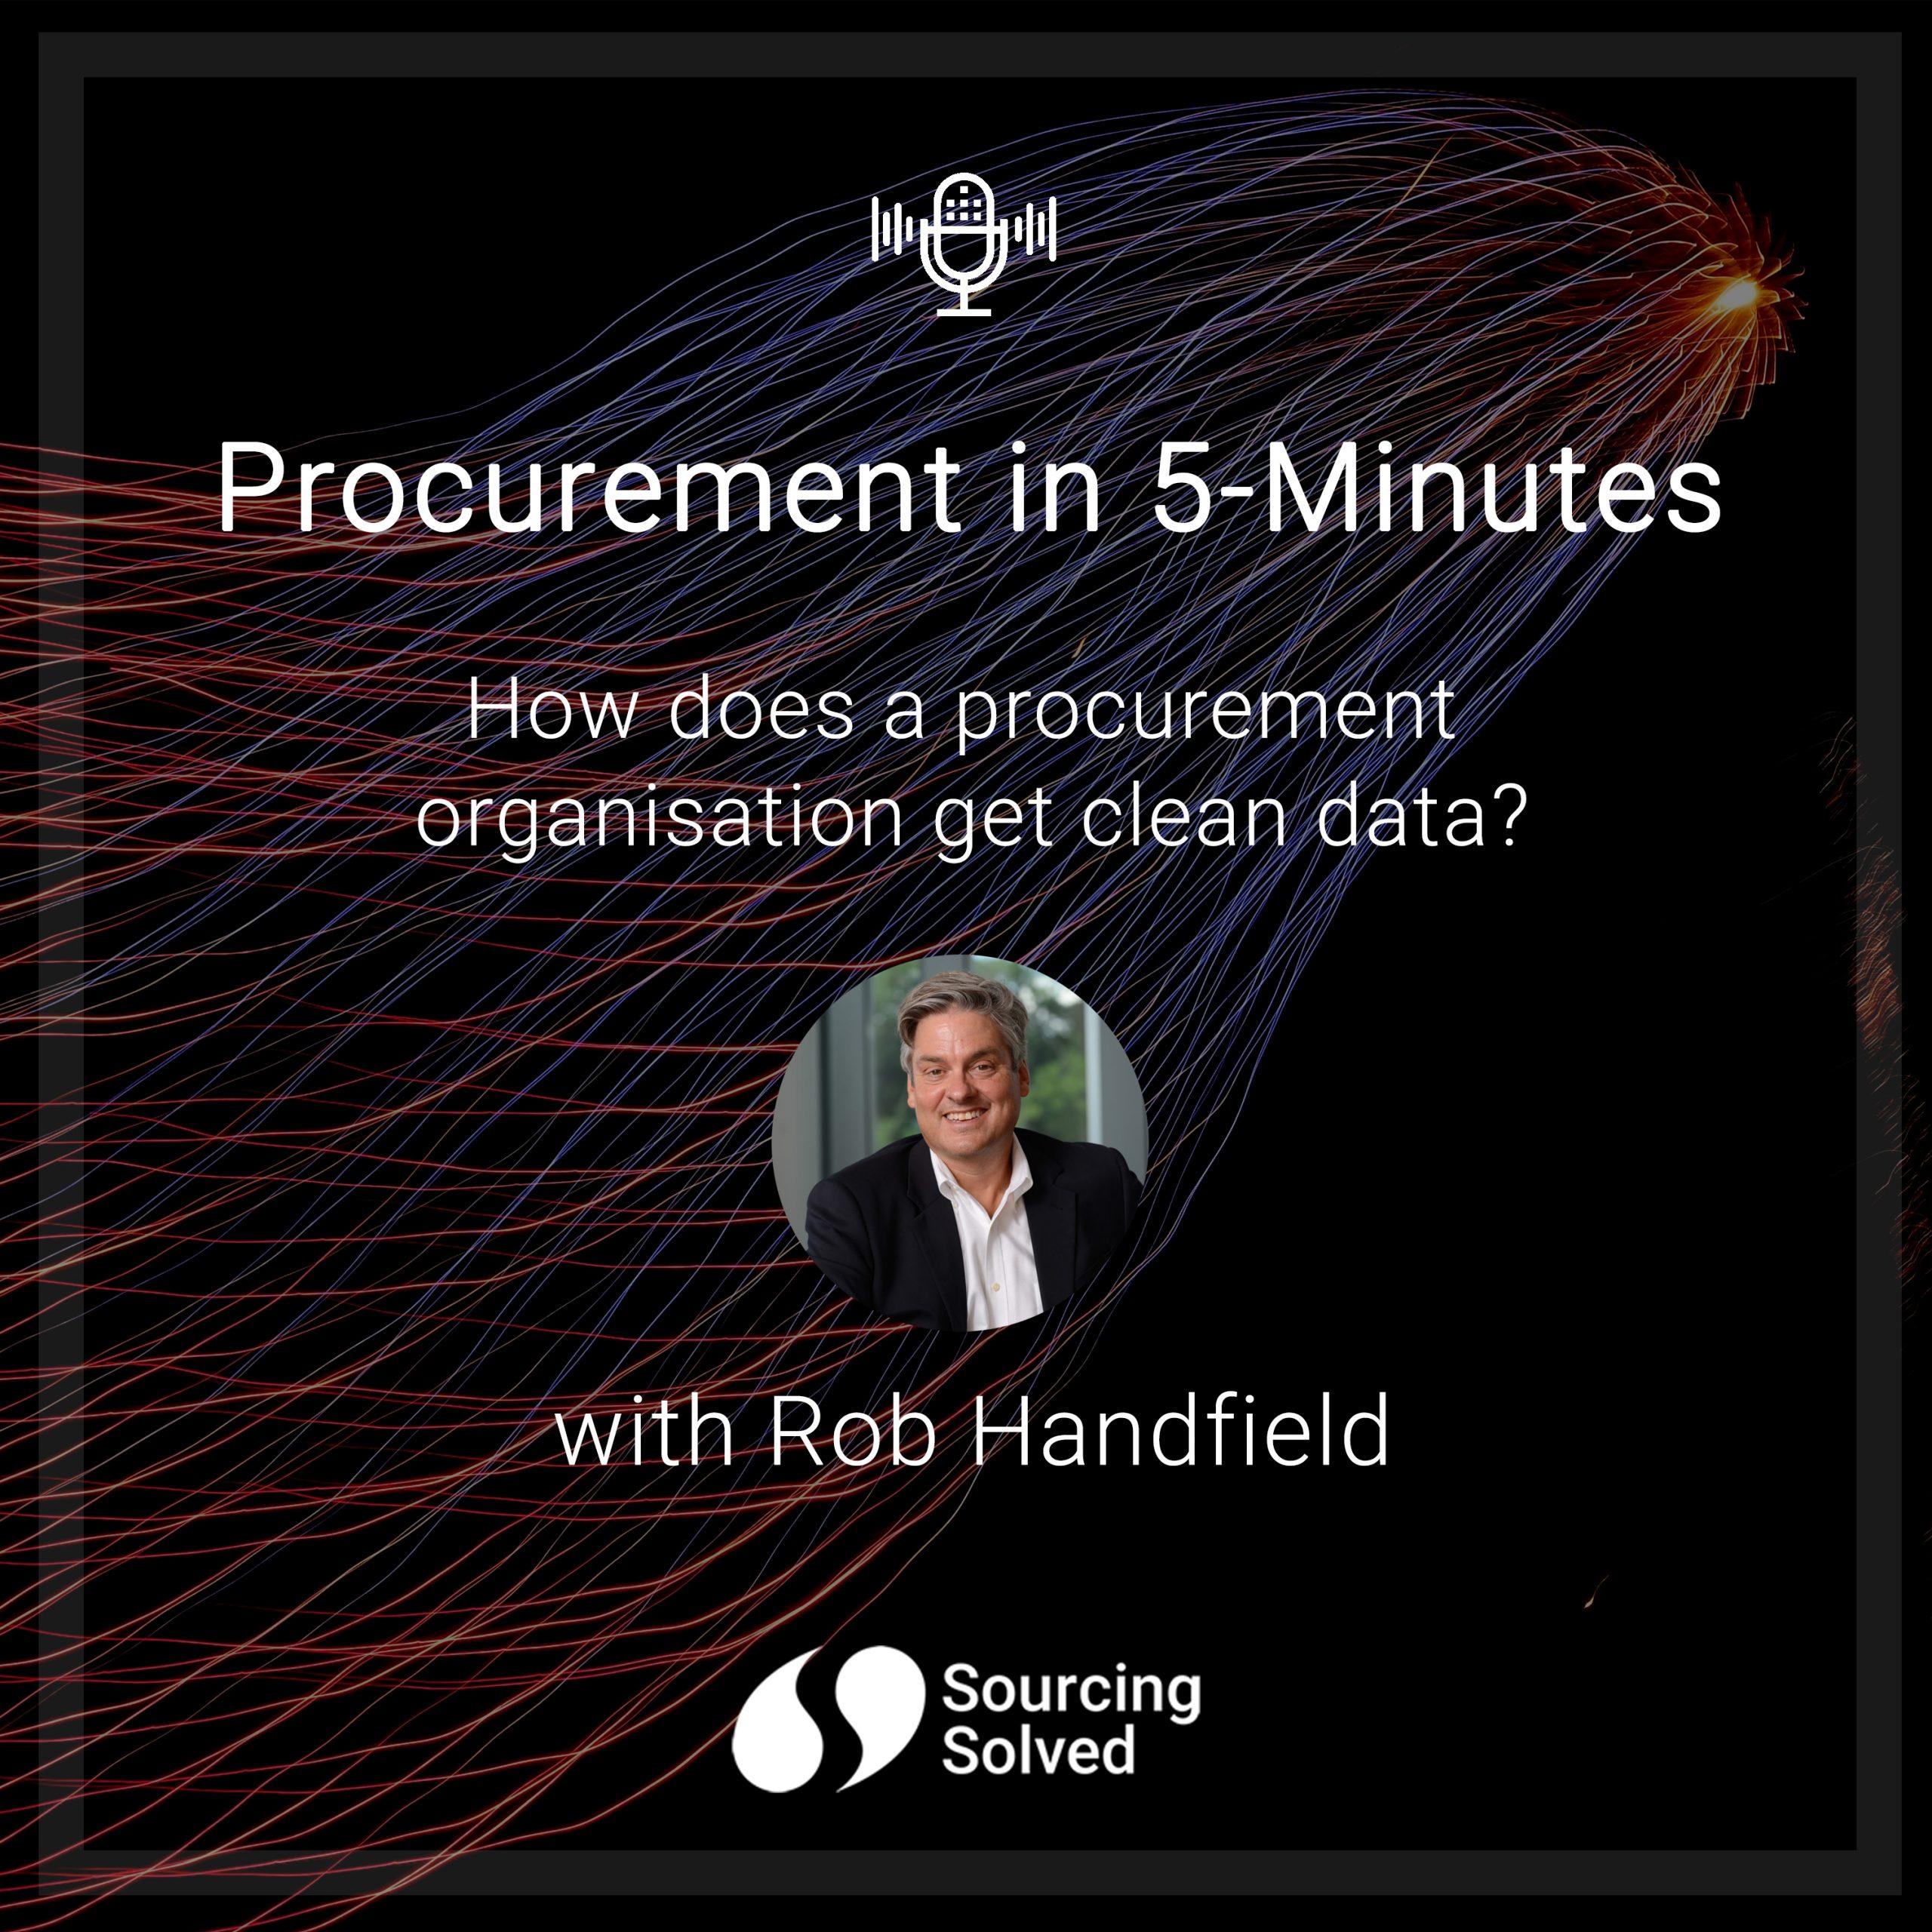 Procurement in 5-Minutes: How does a procurement organisation get clean data?